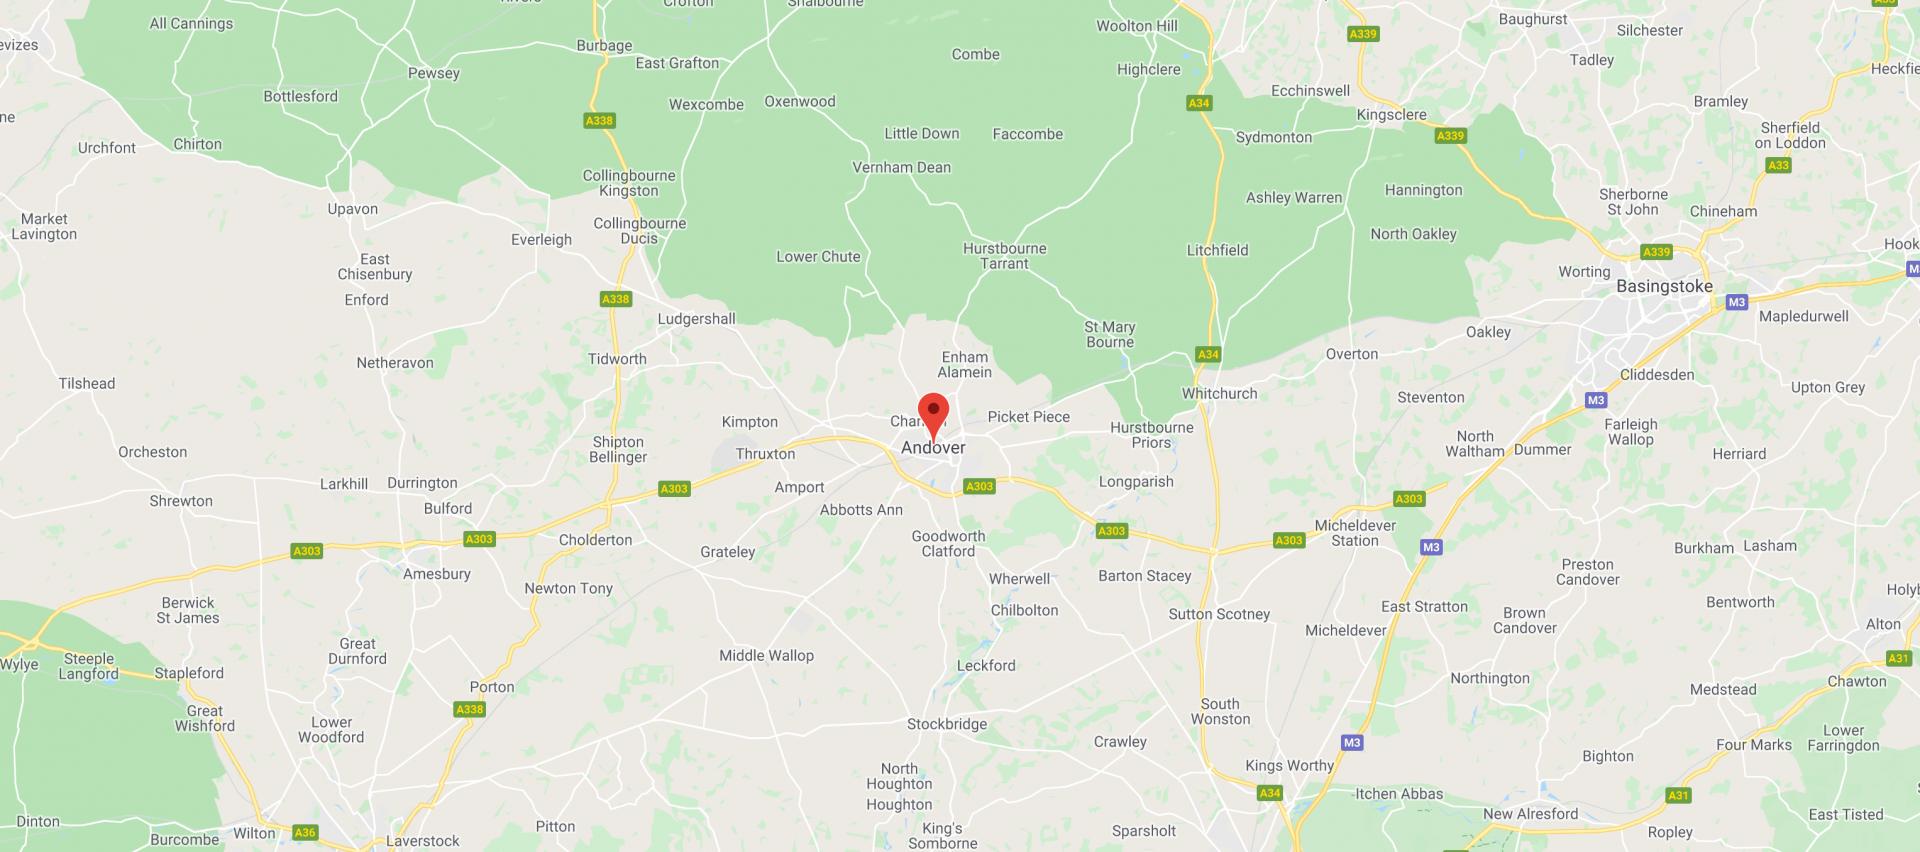 S & J Maddocks map location